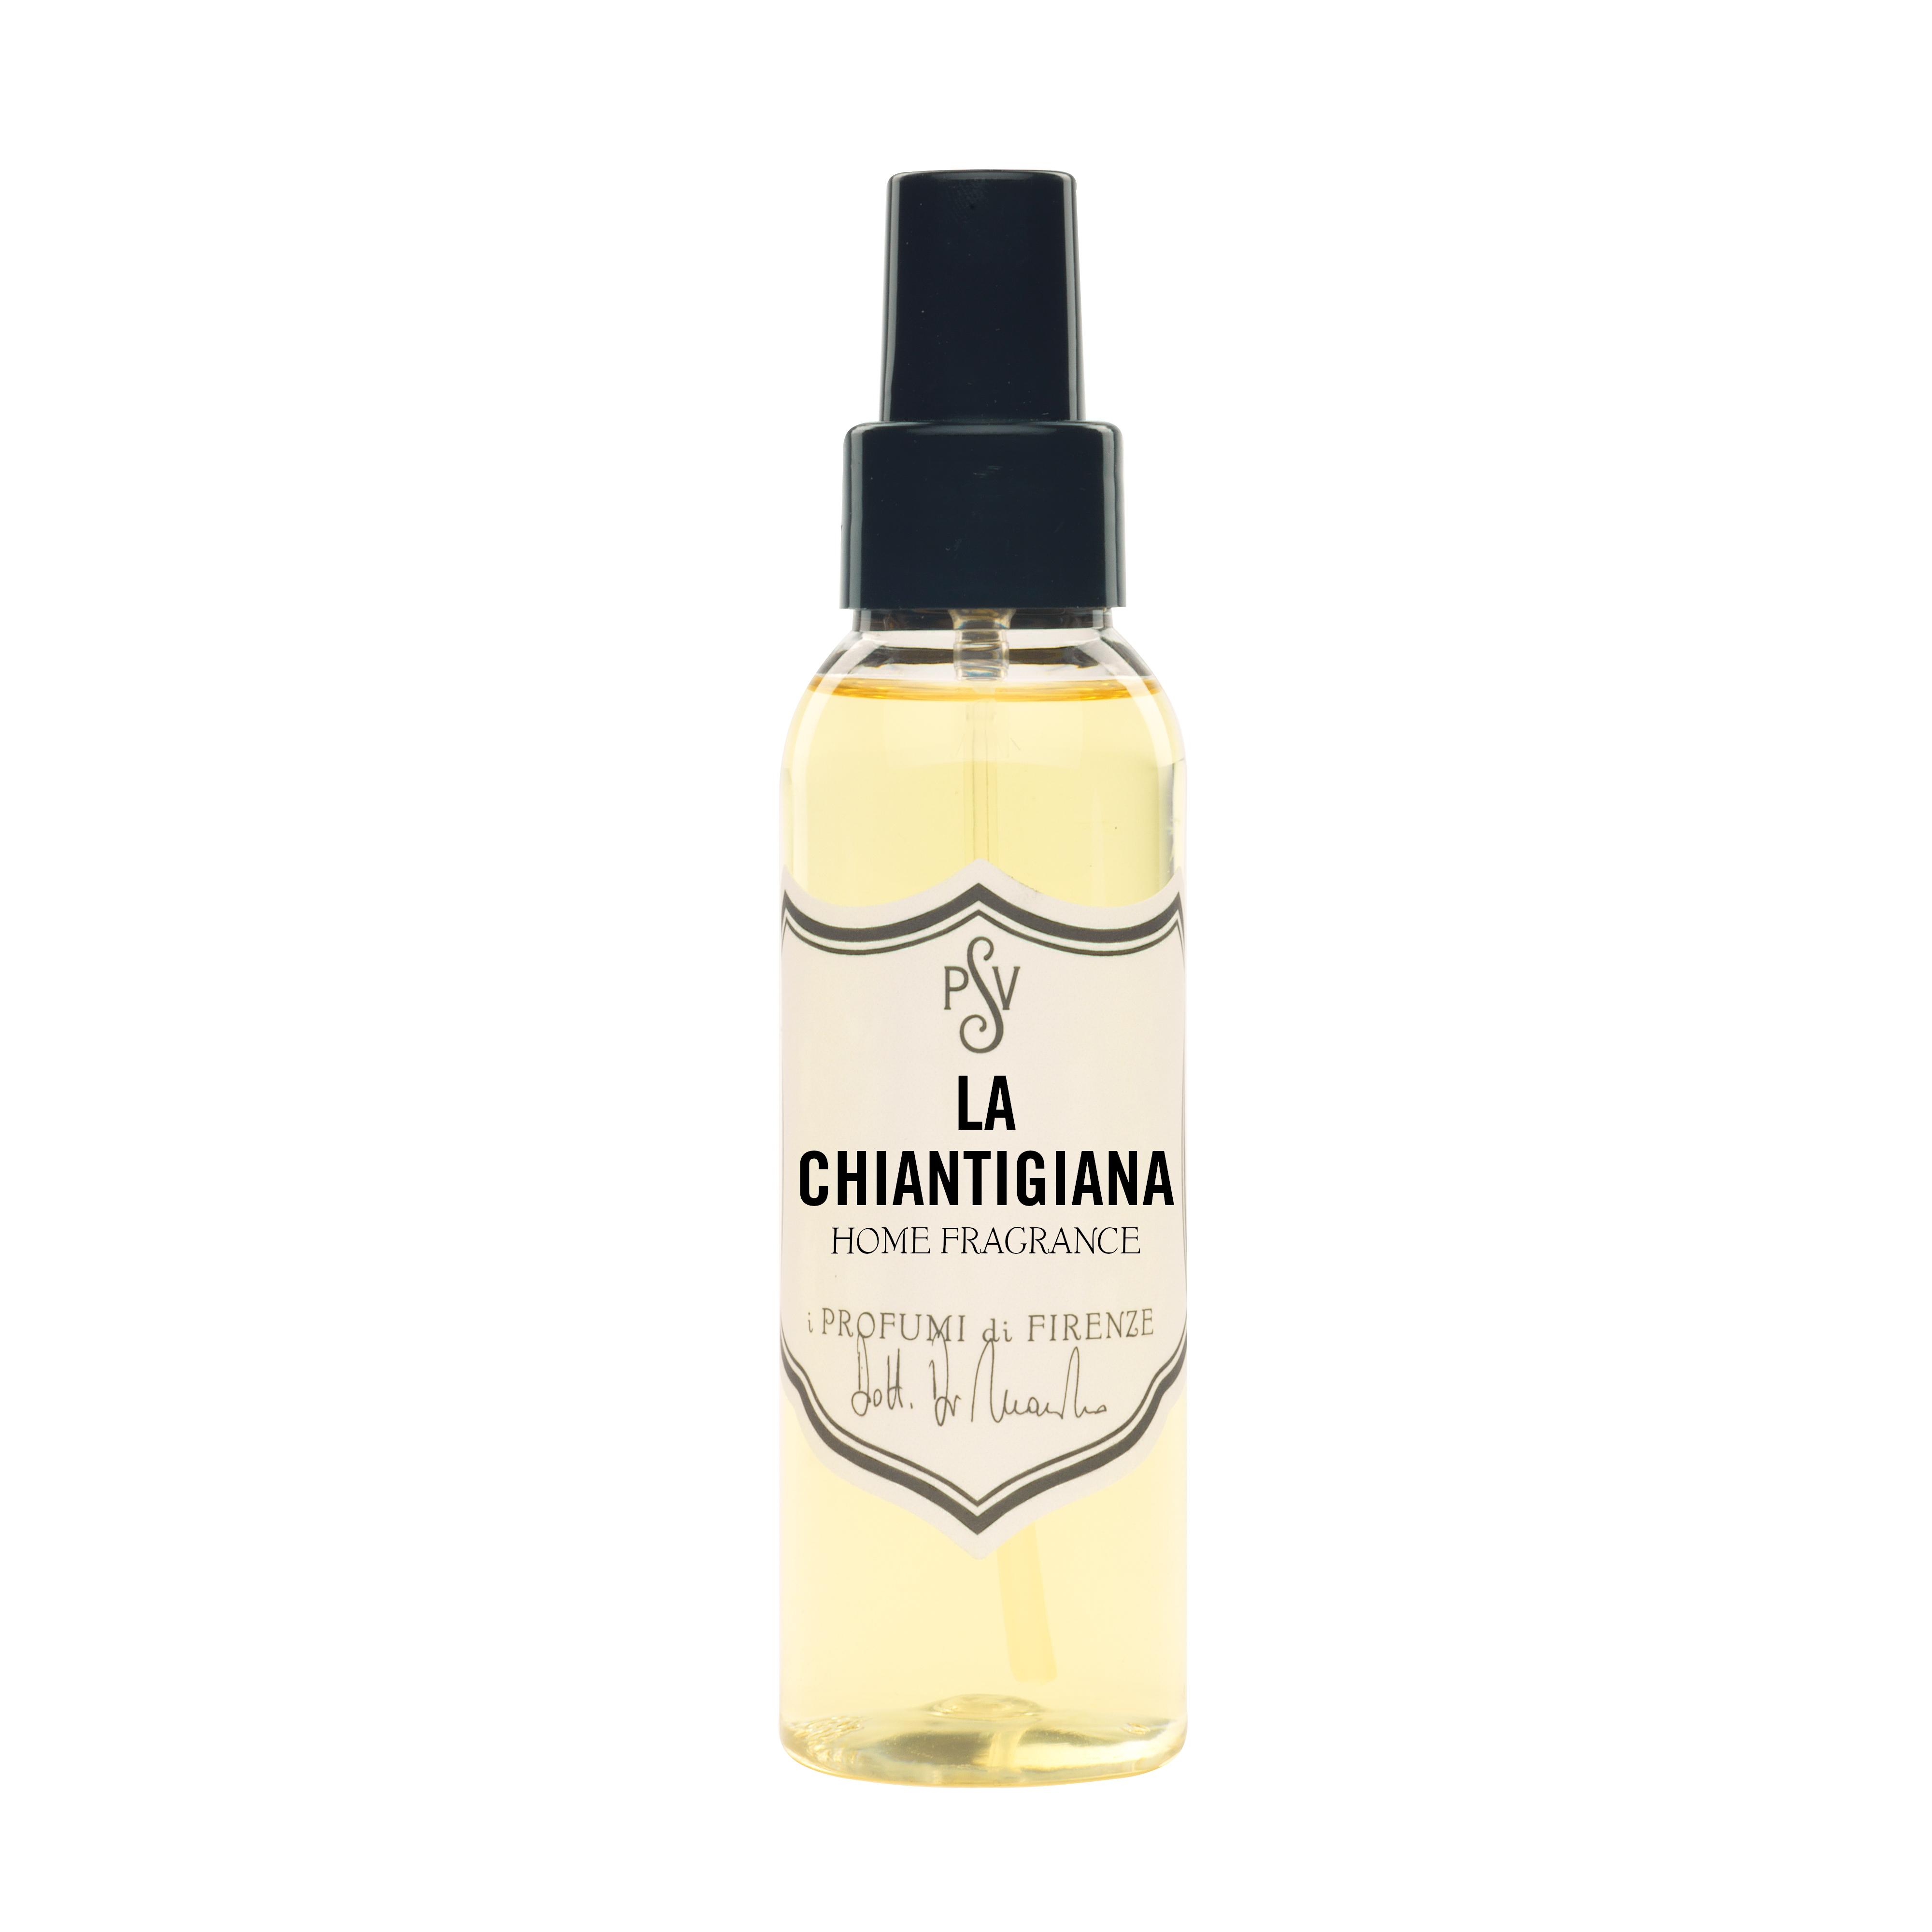 LA CHIANTIGIANA - Home Fragrance-4500